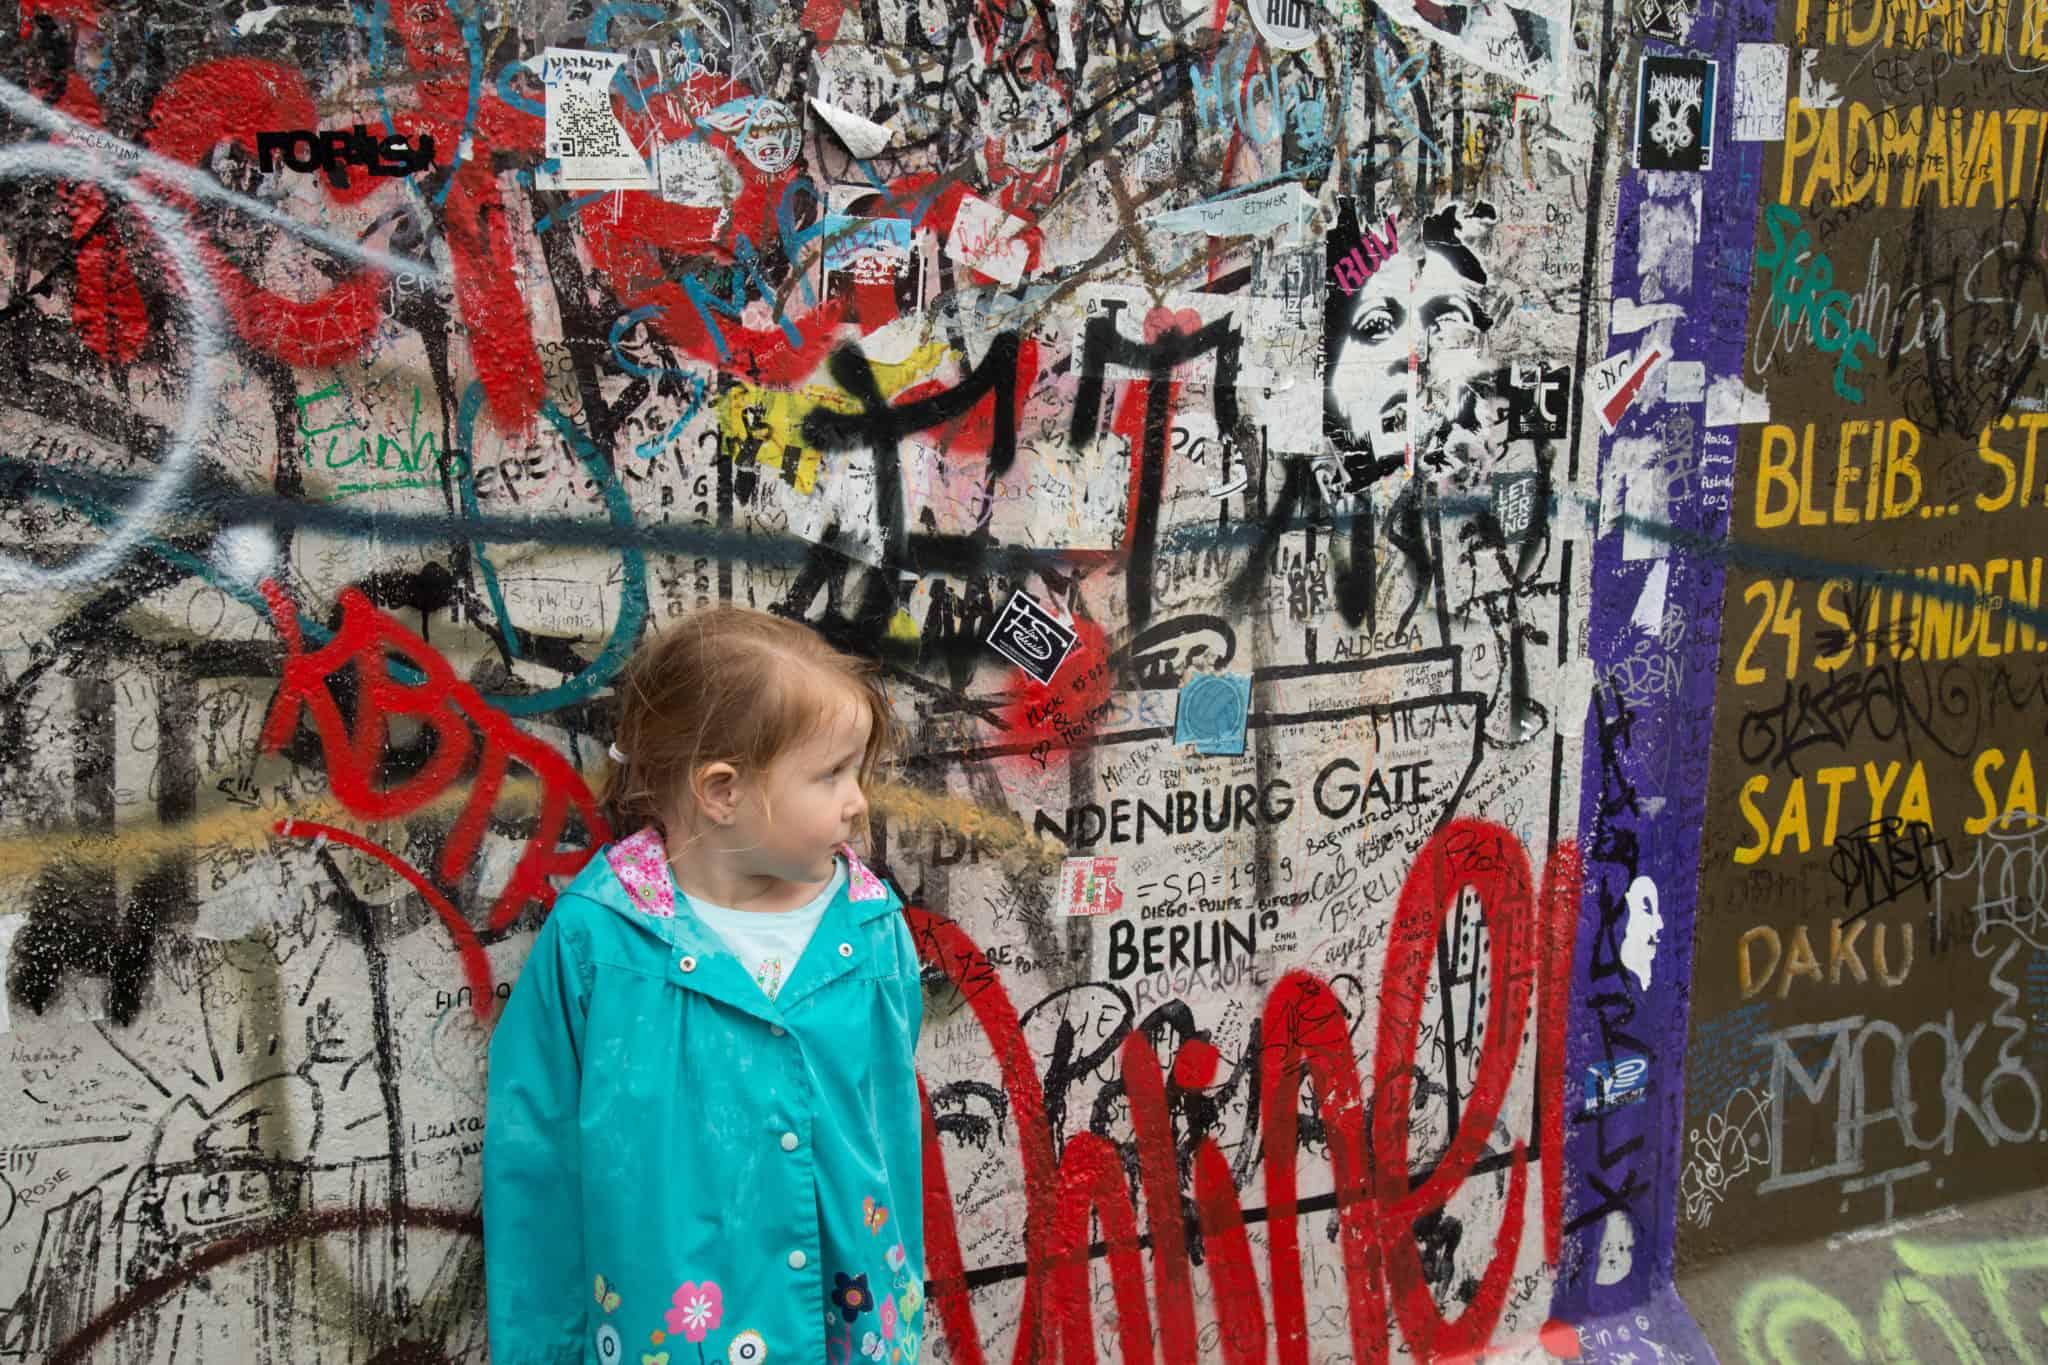 TravelwithMeraki- Travel with kids - Berlin Wall - Berlin - Germany